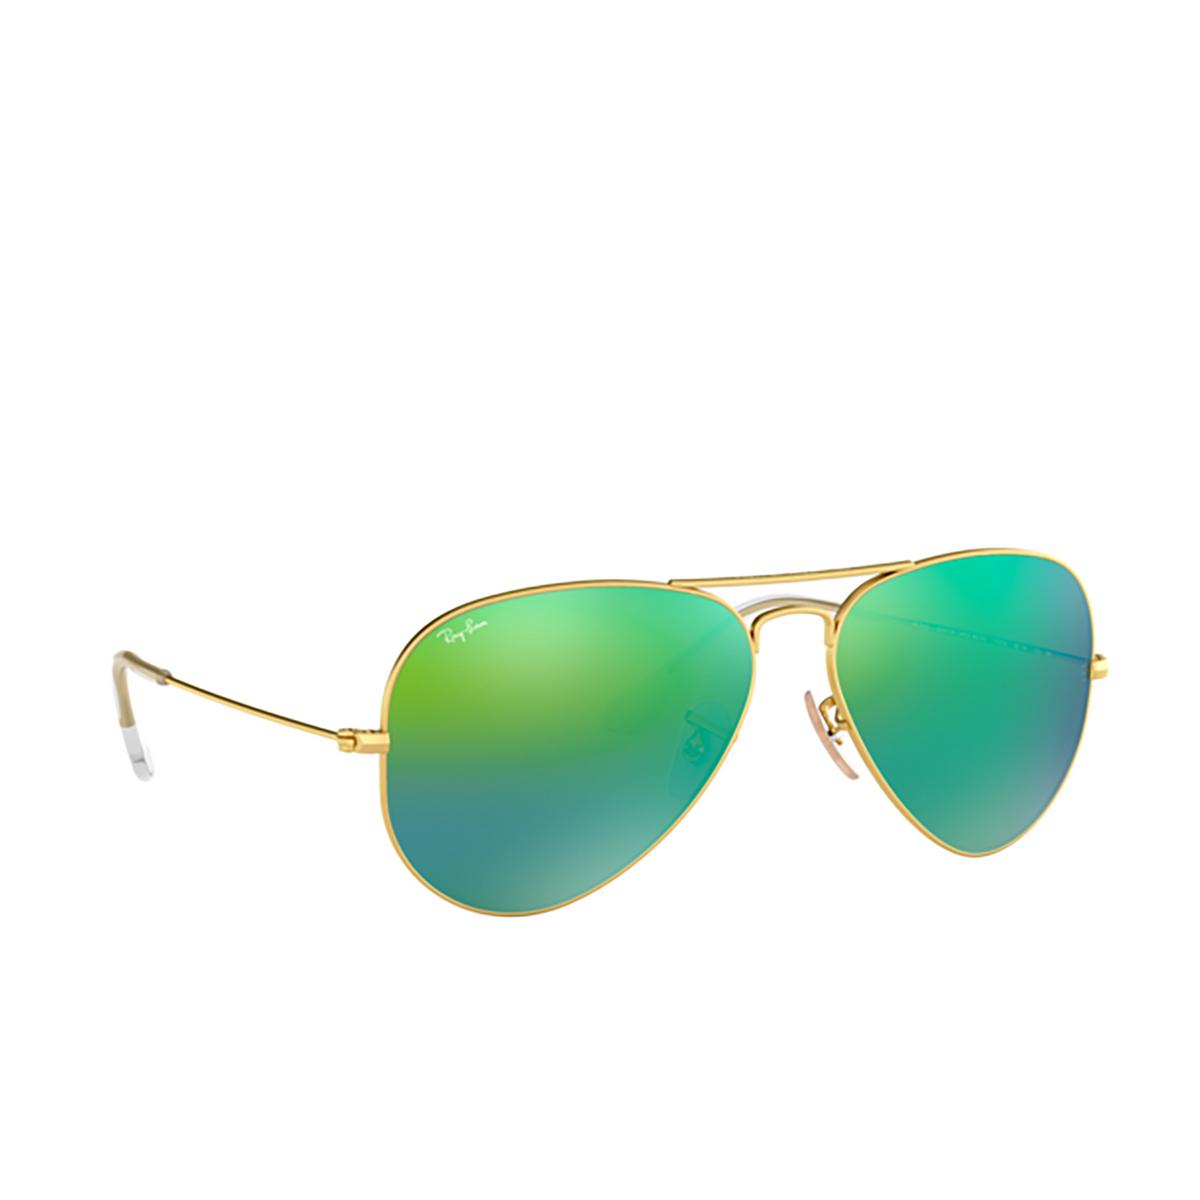 Ray-Ban® Aviator Sunglasses: Aviator Large Metal RB3025 color Matte Arista 112/19 - three-quarters view.